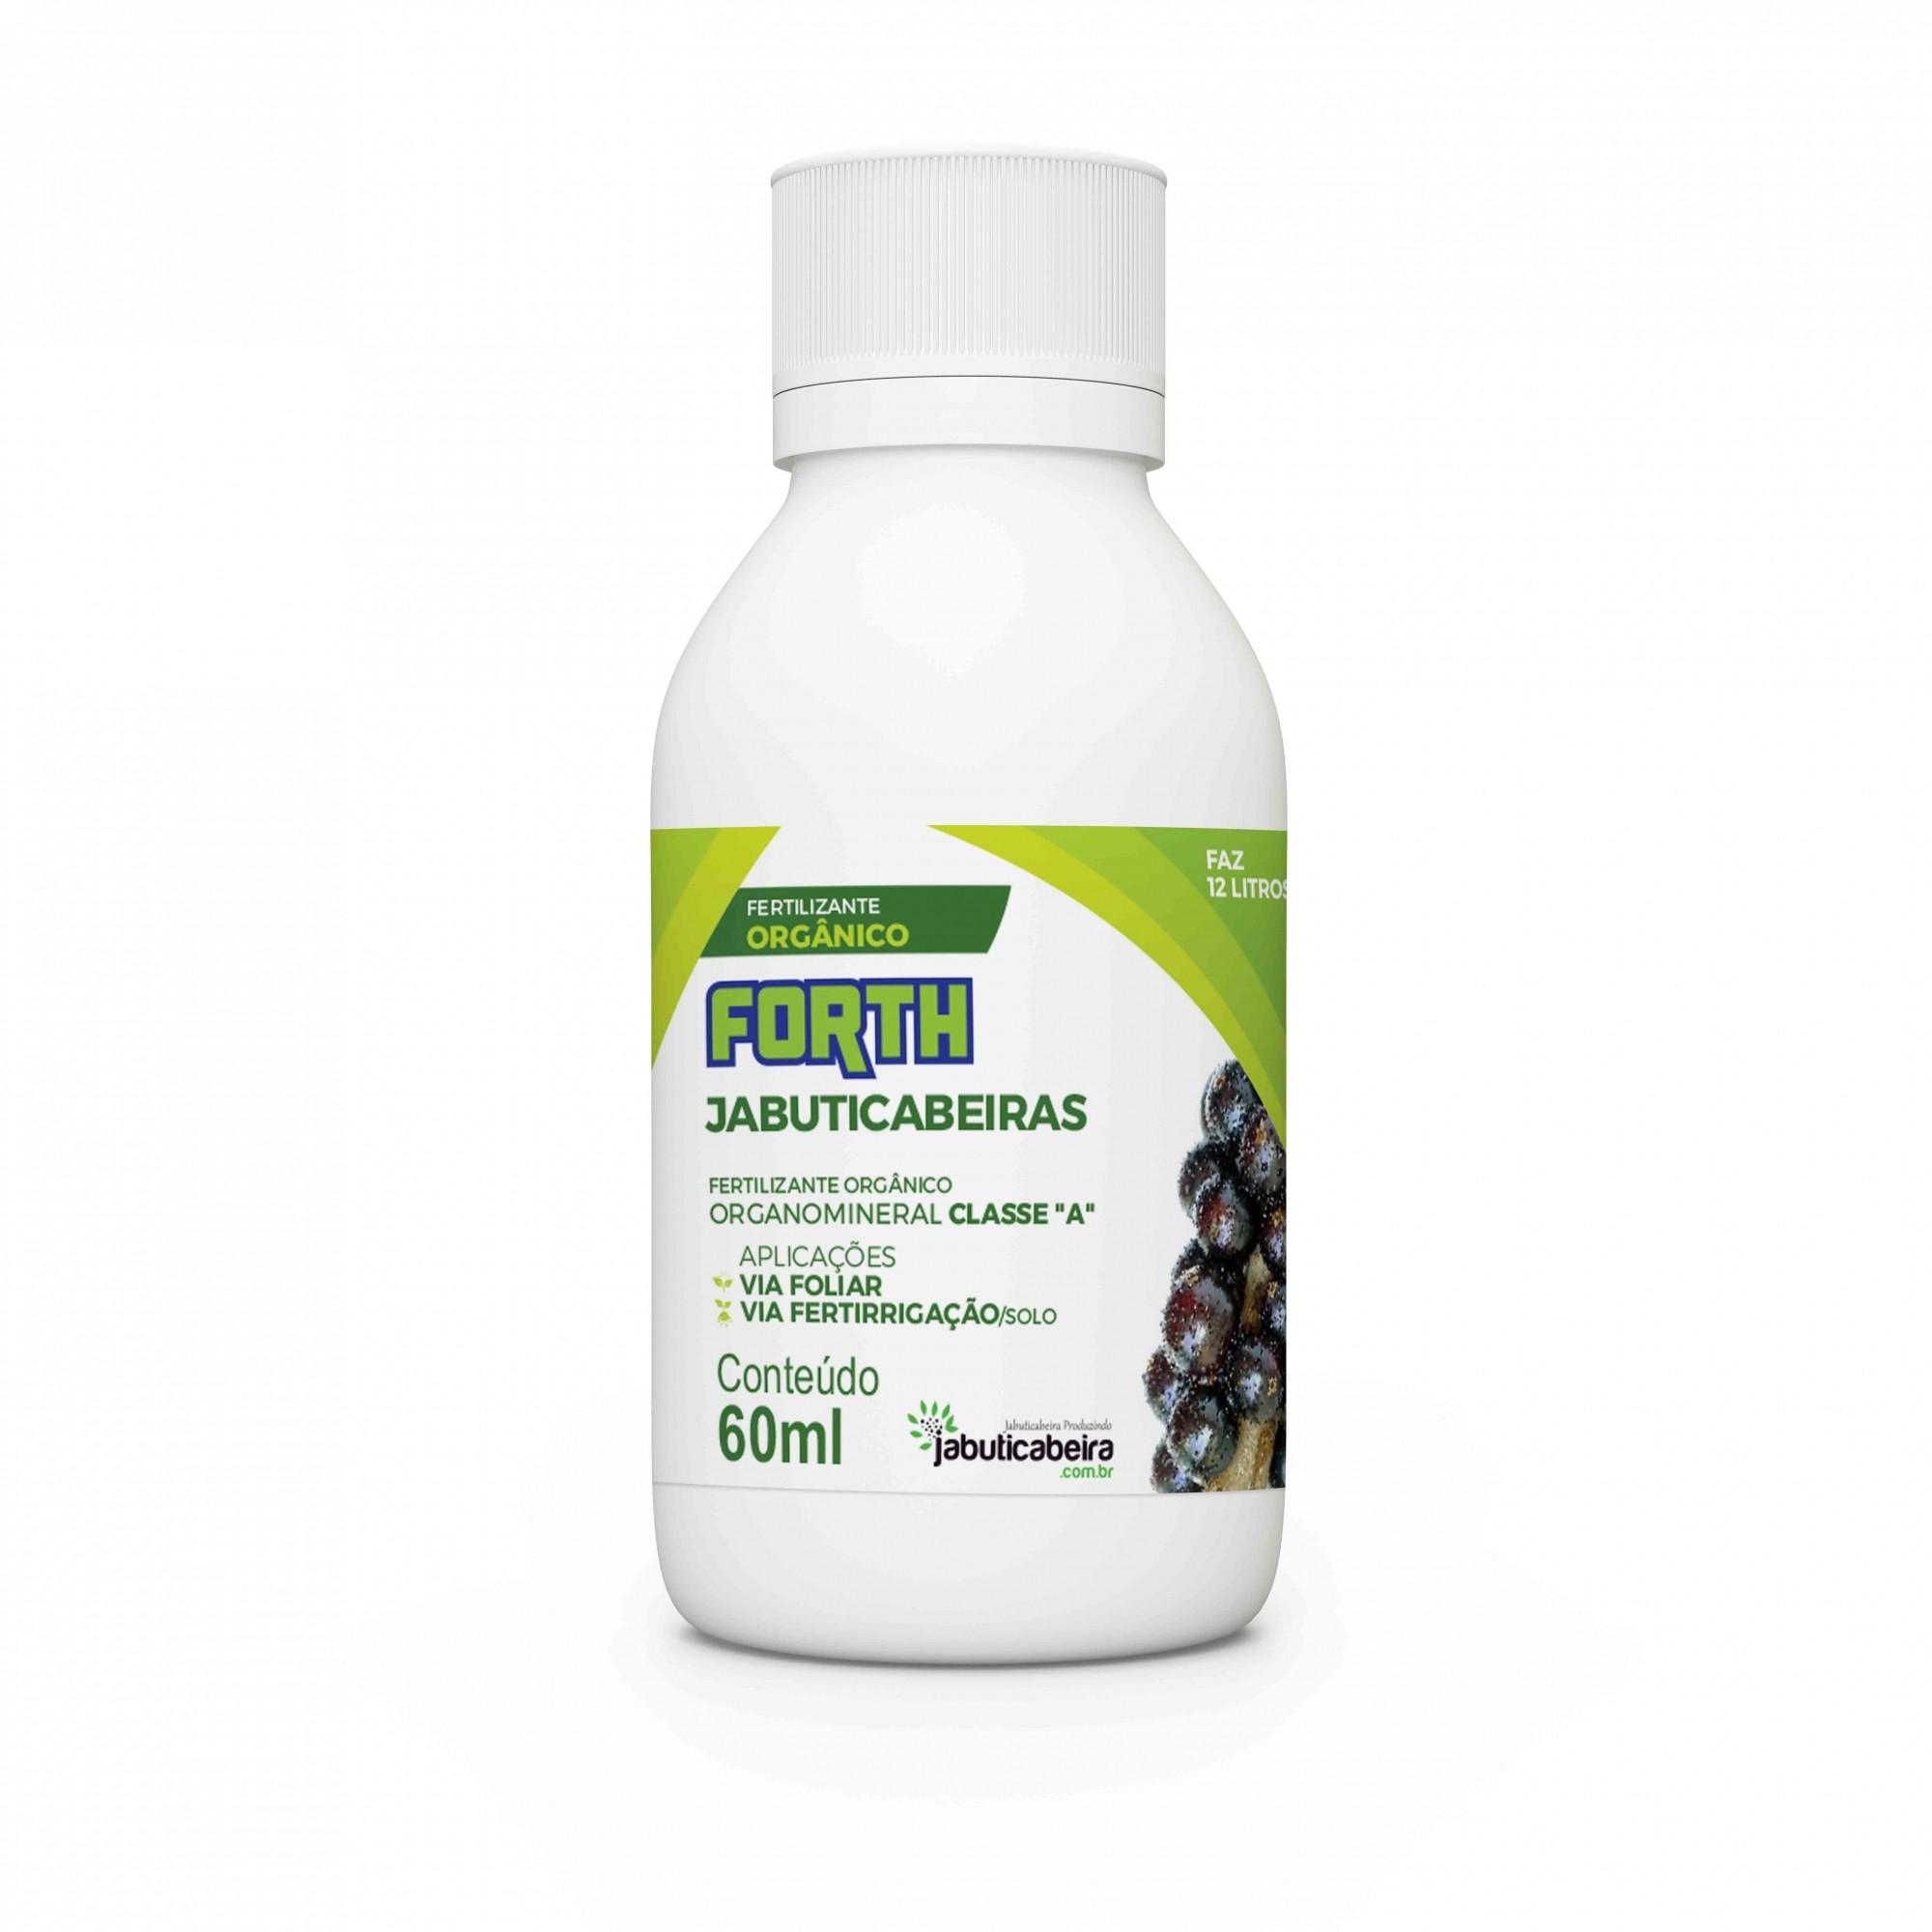 Fertilizante Forth Jabuticabeiras 60ml Concentrado